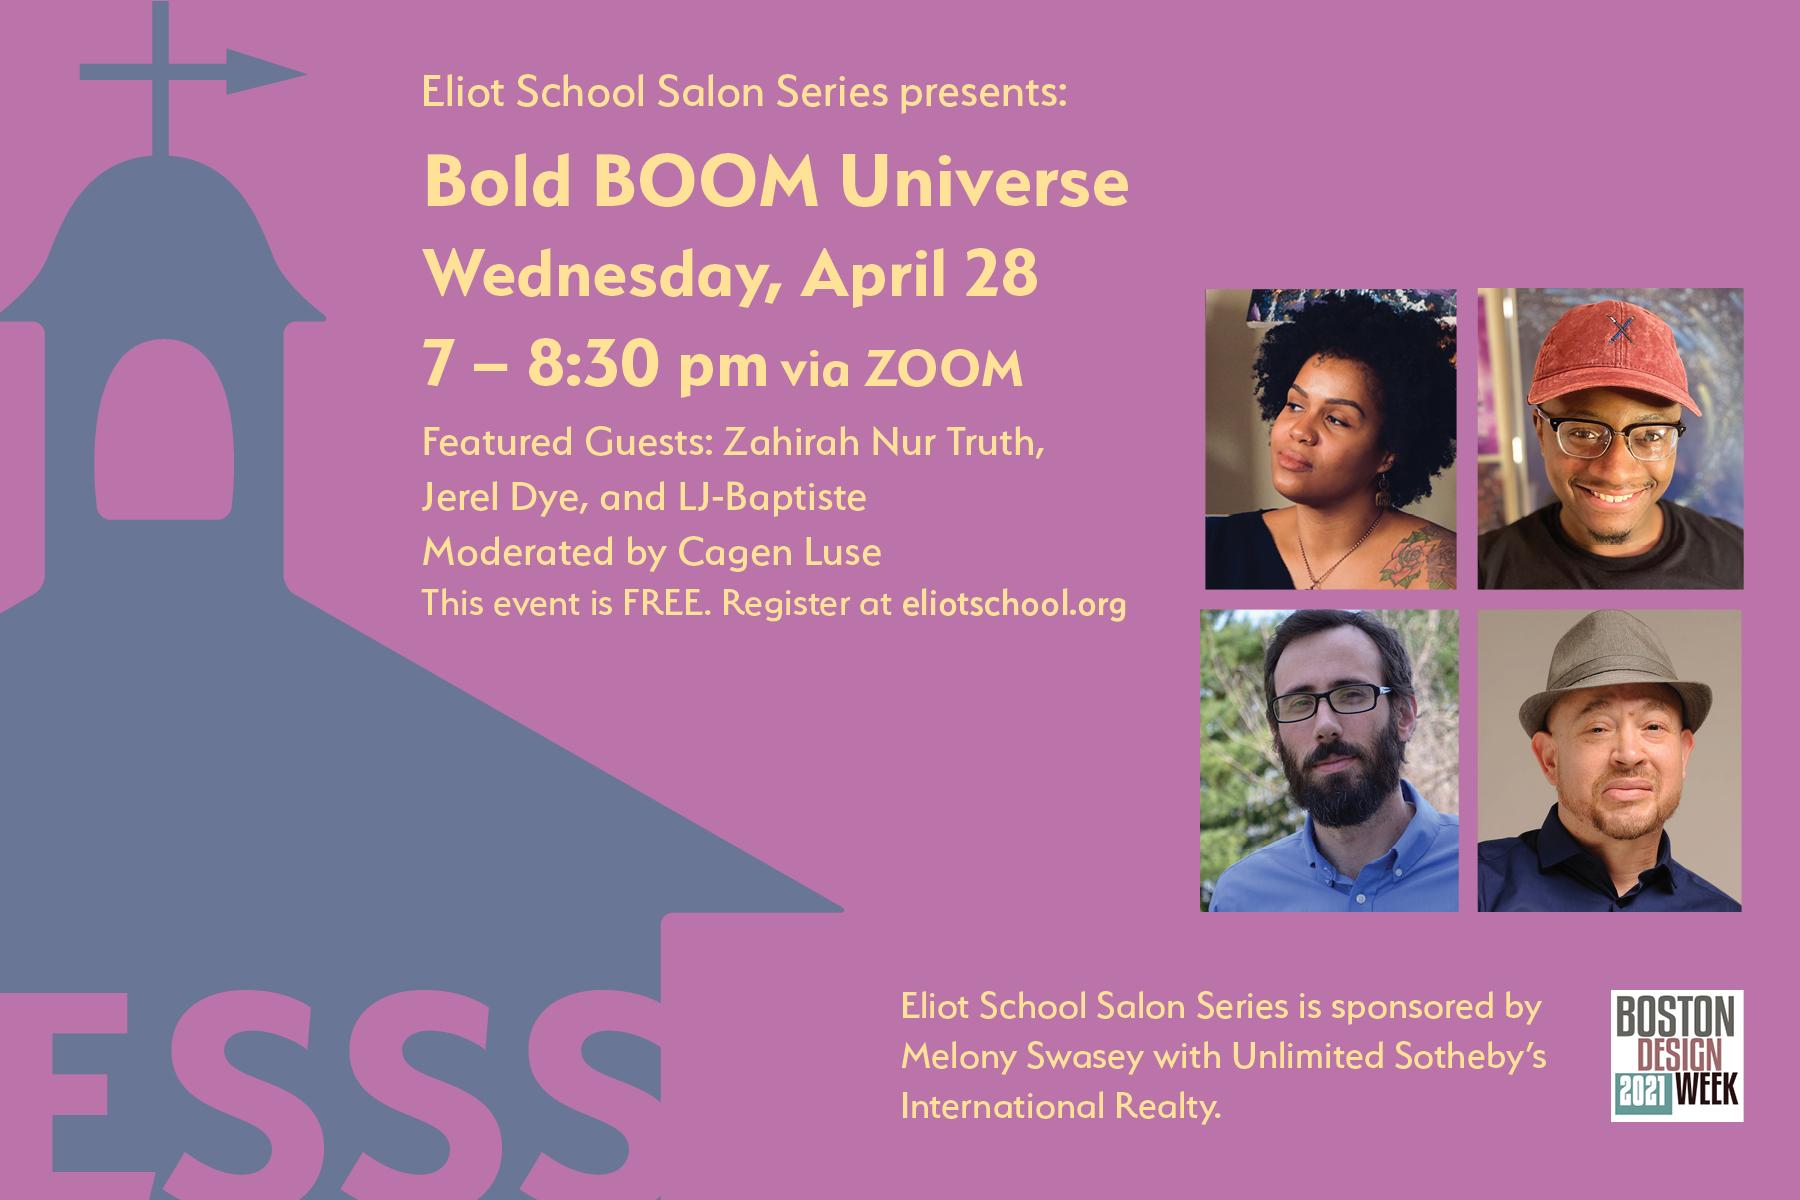 Eliot School Salon Series Bold Boom Universe Flyer